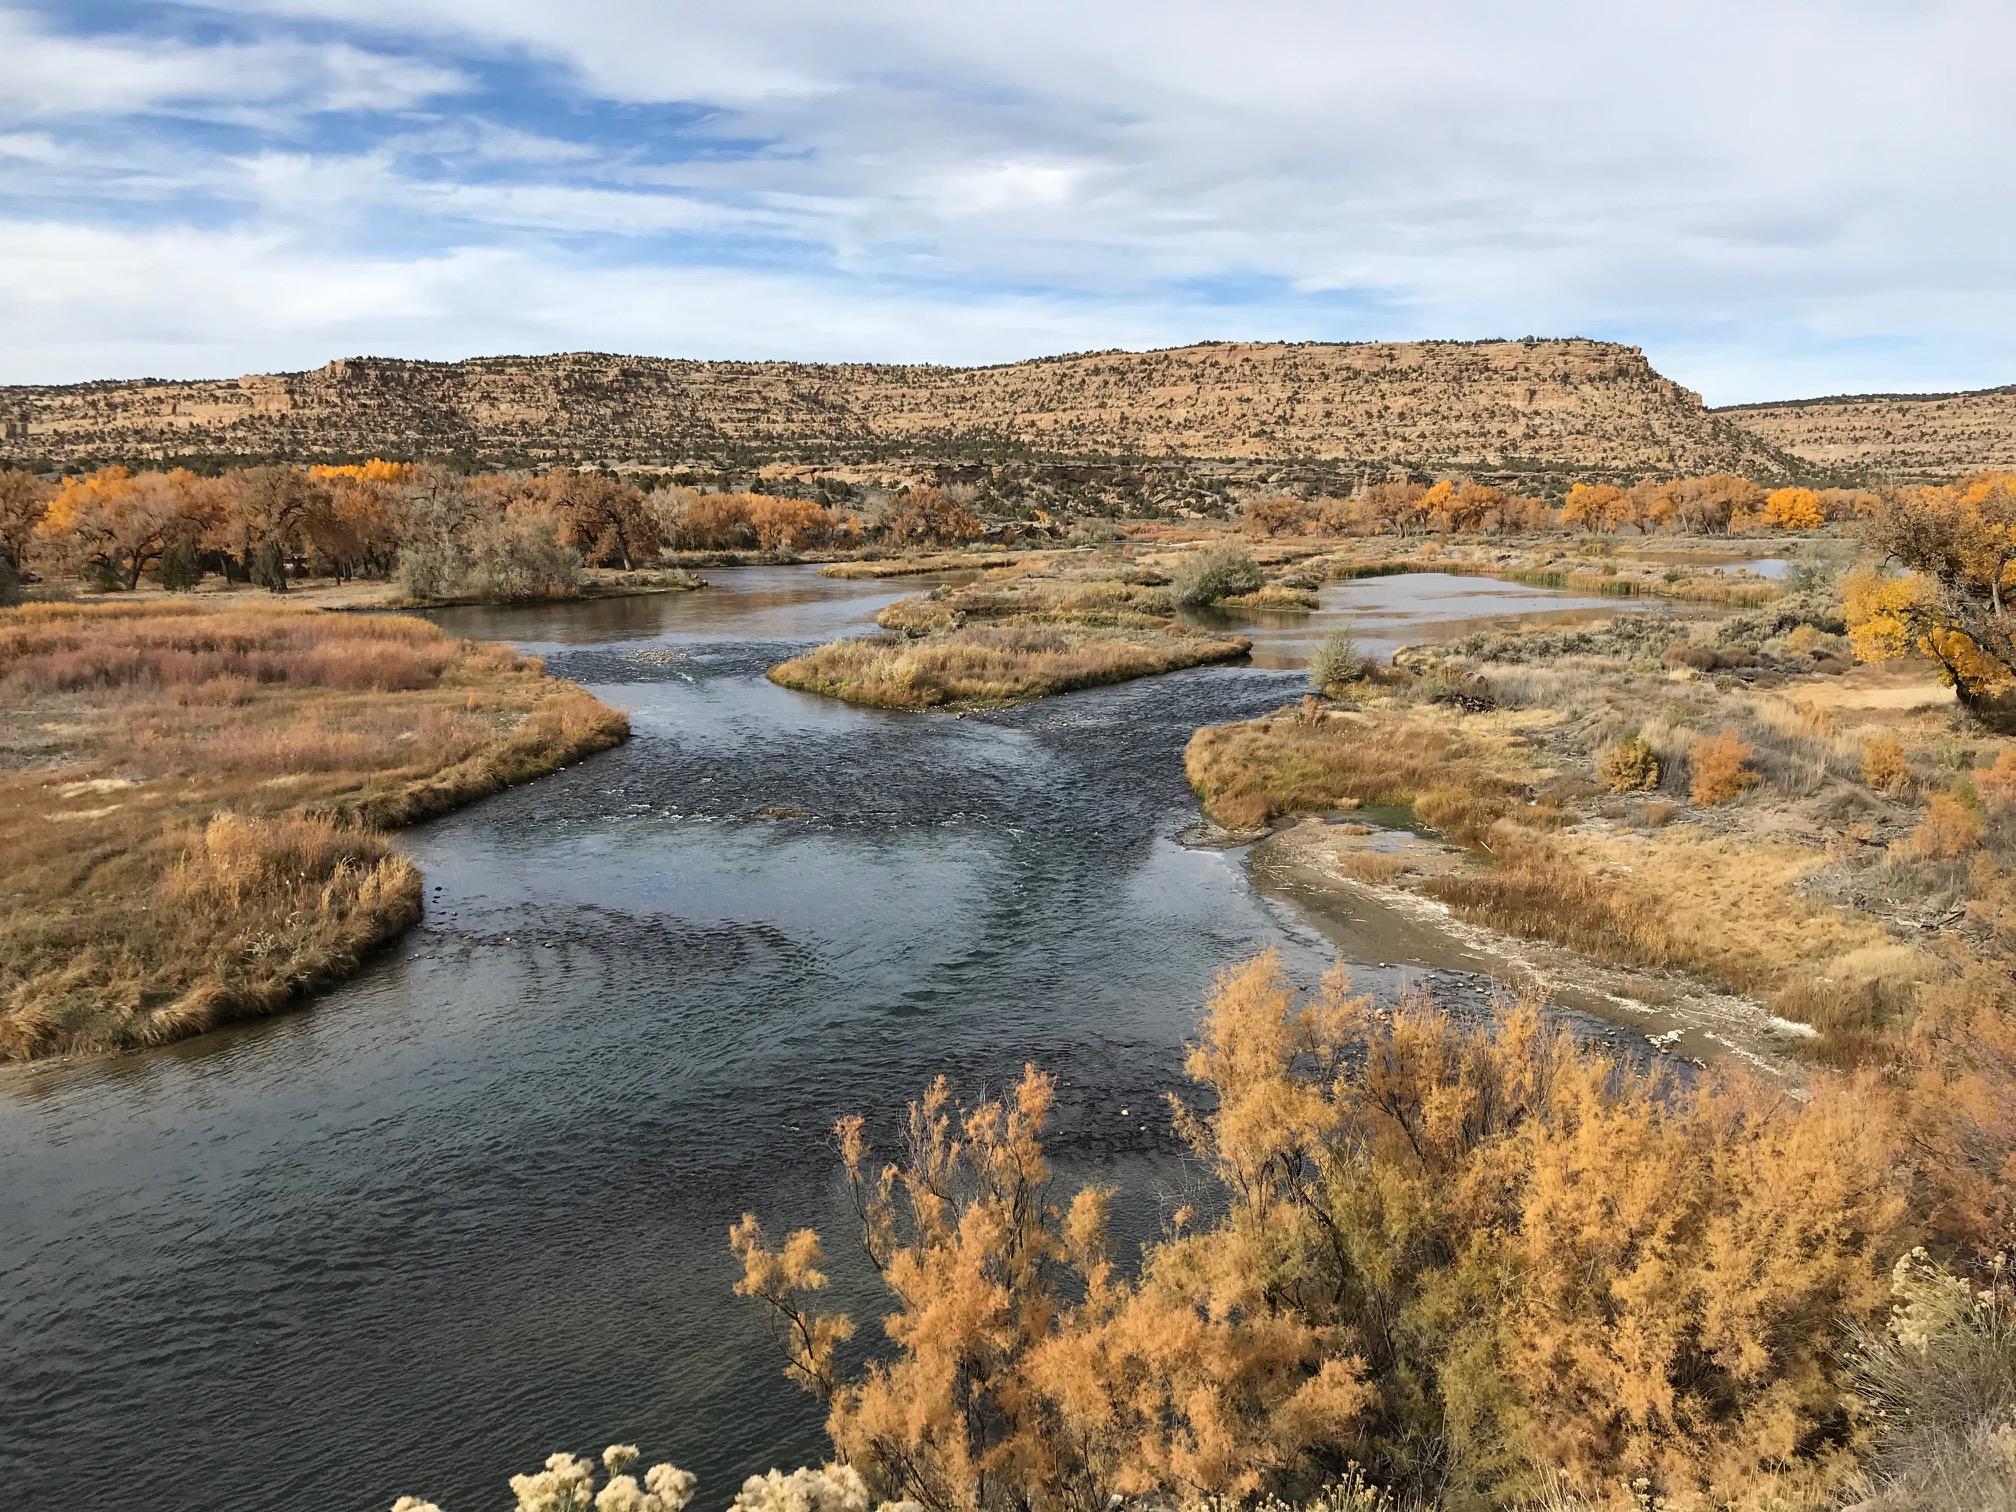 San Juan River, New Mexico